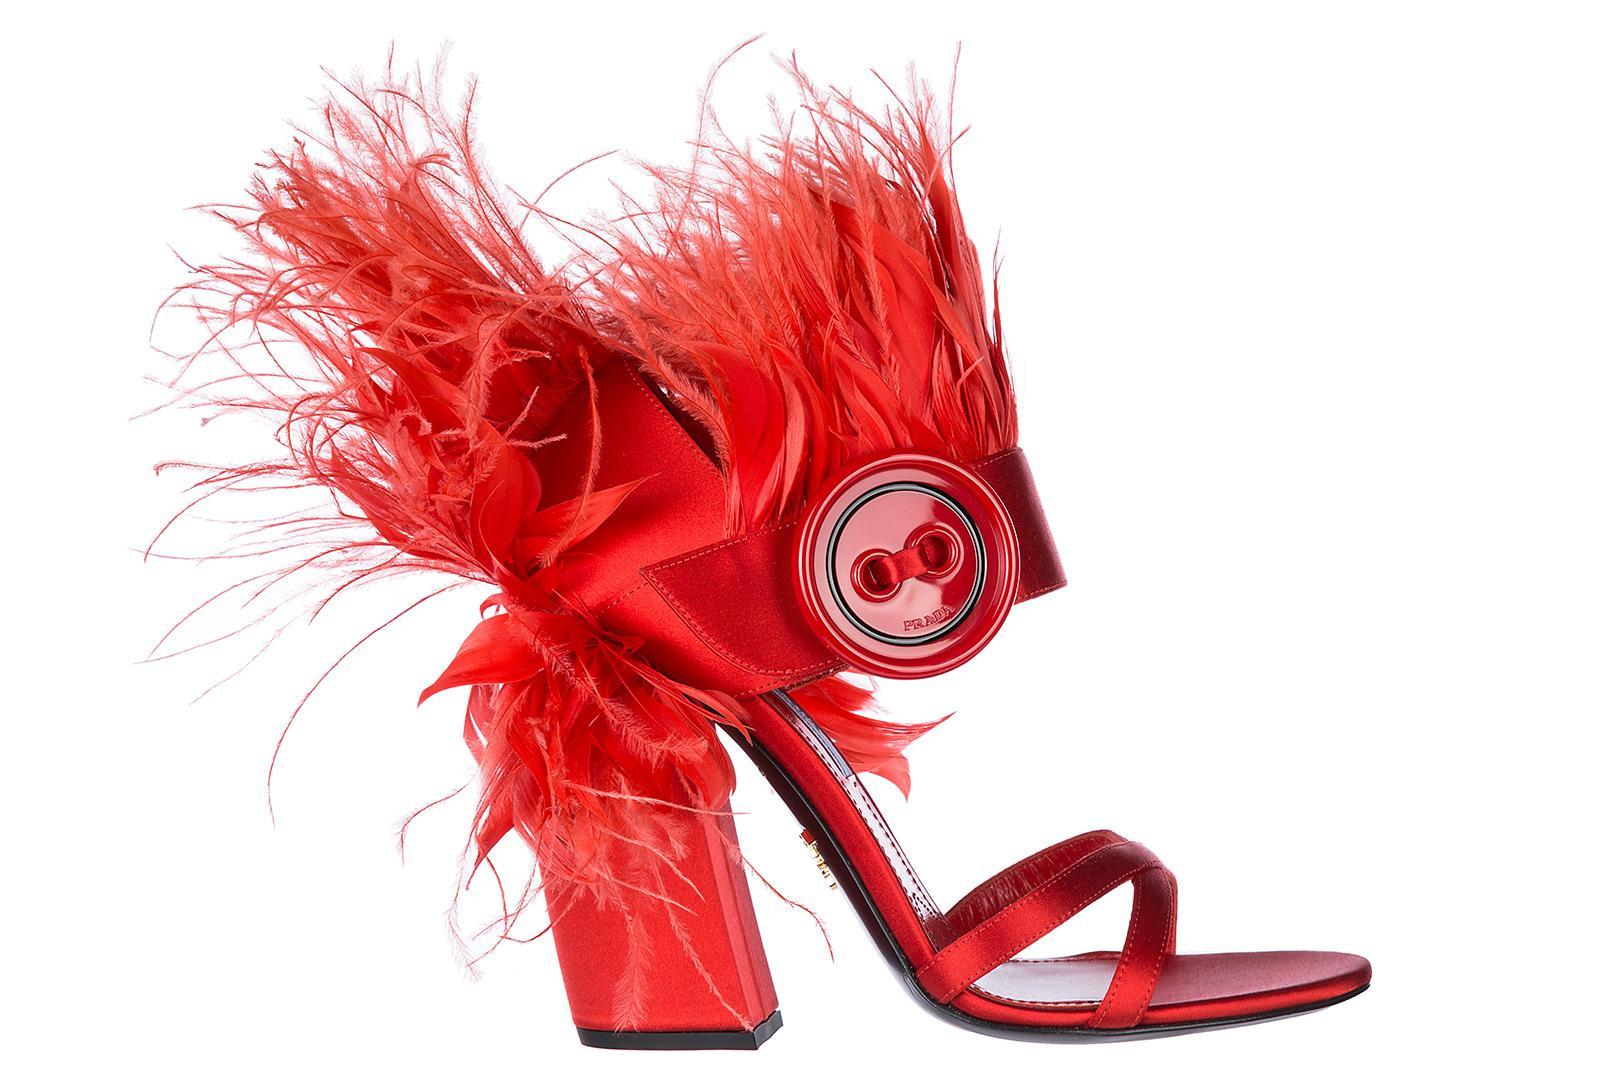 ab9db382c92 Prada Women s Heel Sandals In Red